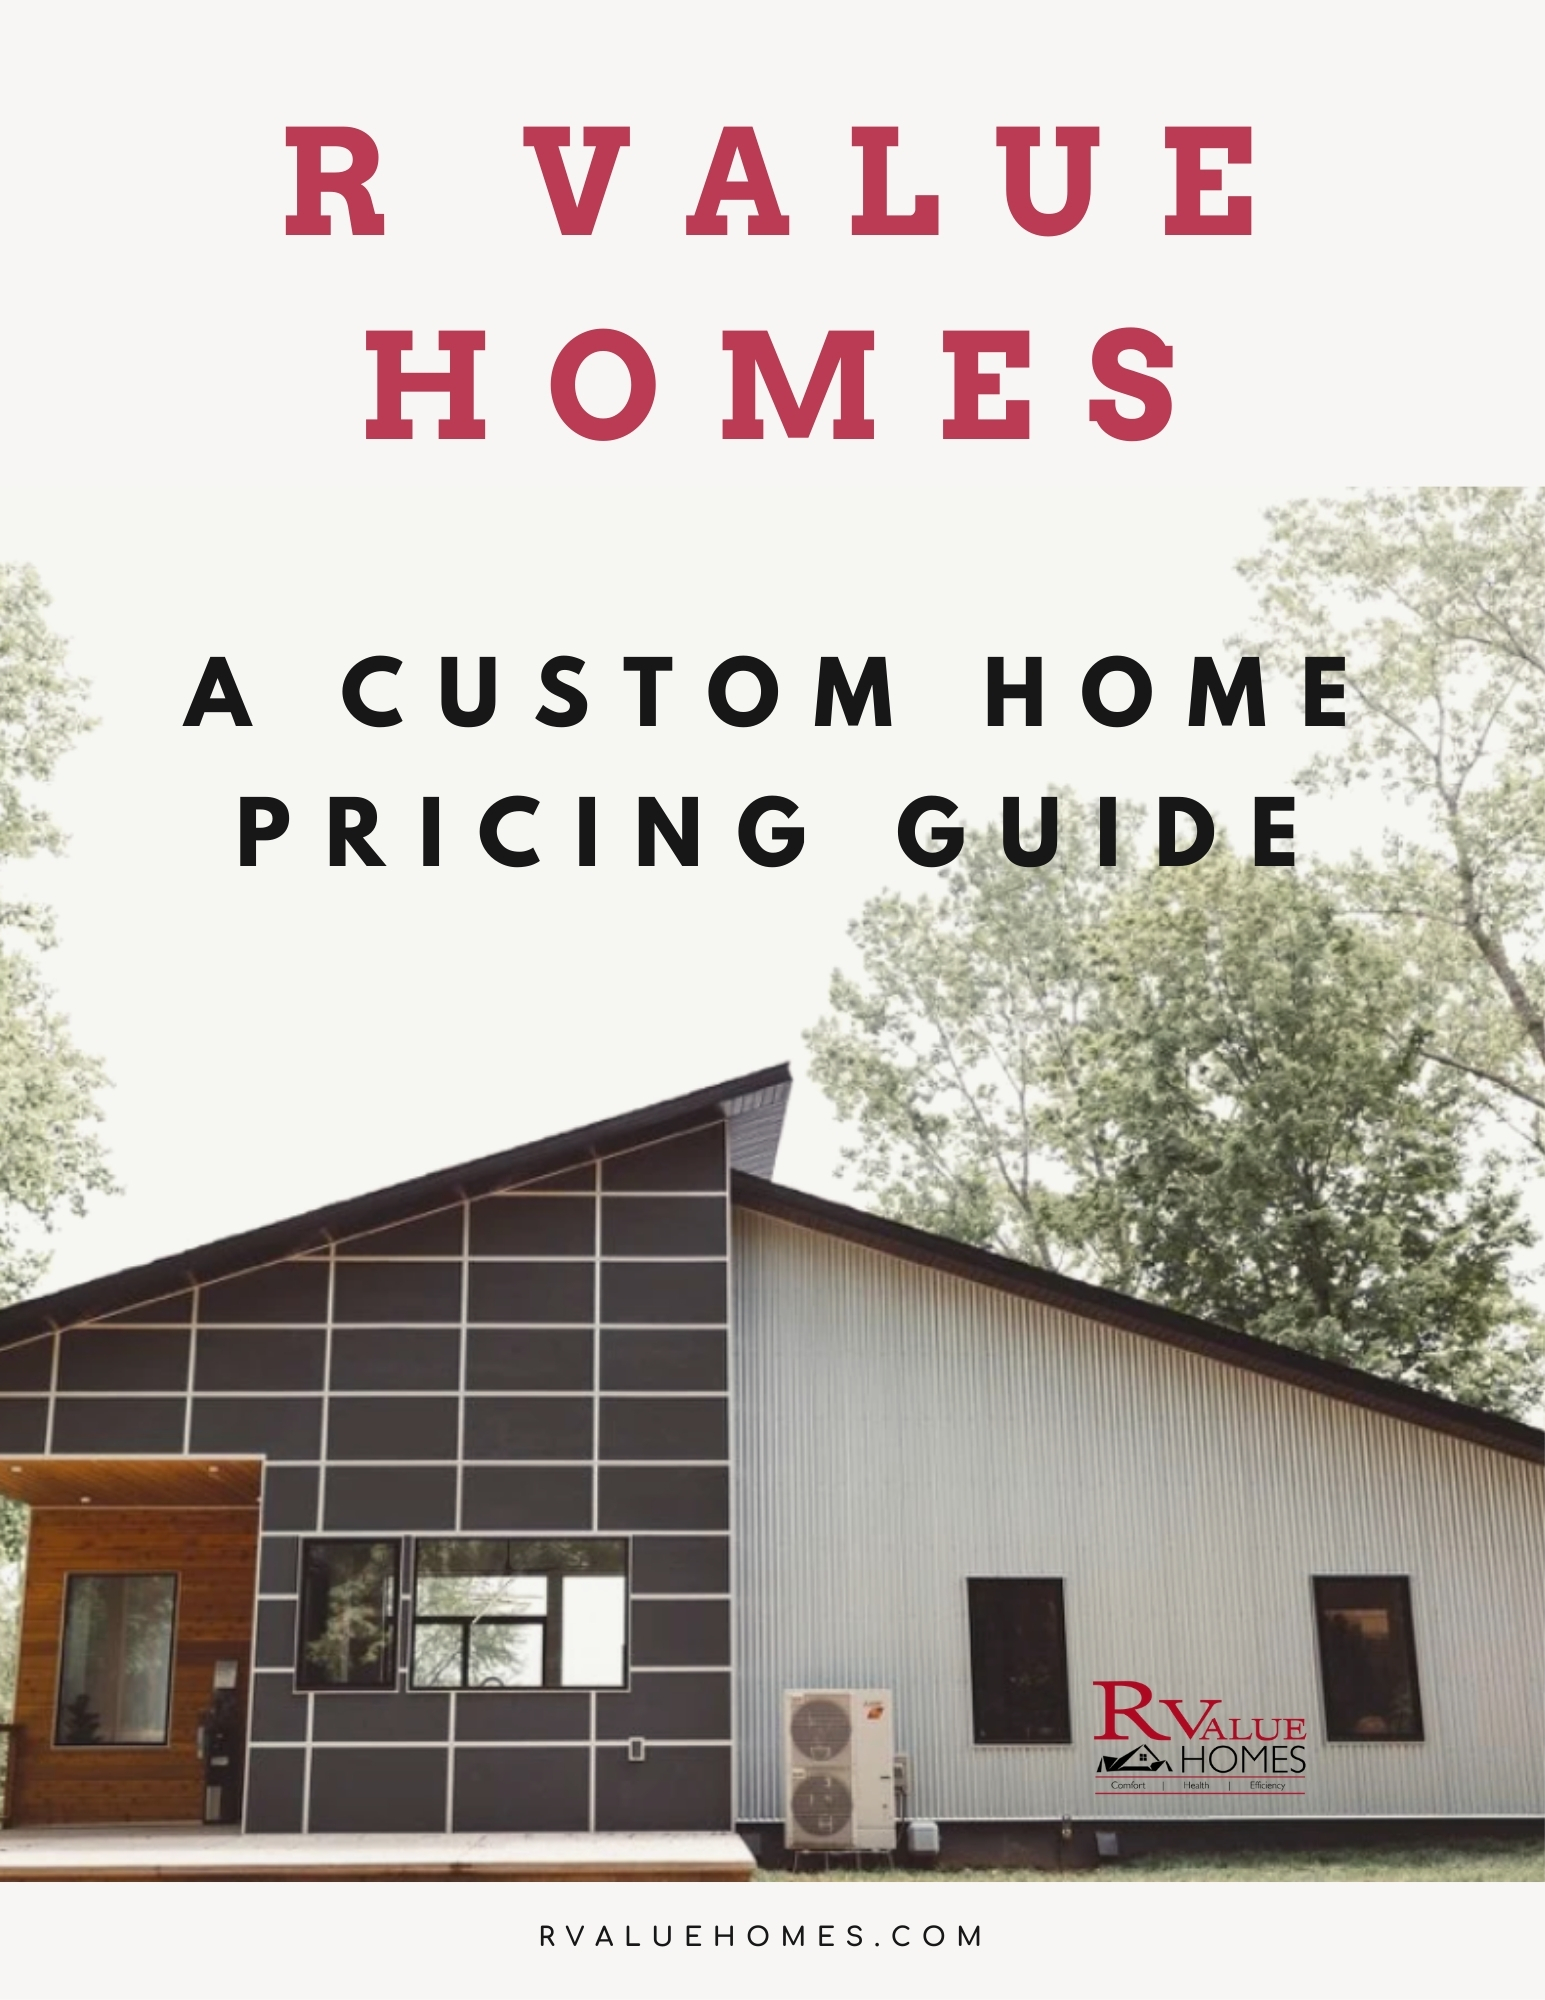 Michigan Building a Custom Home Pricing Guide Ebook RValue Homes